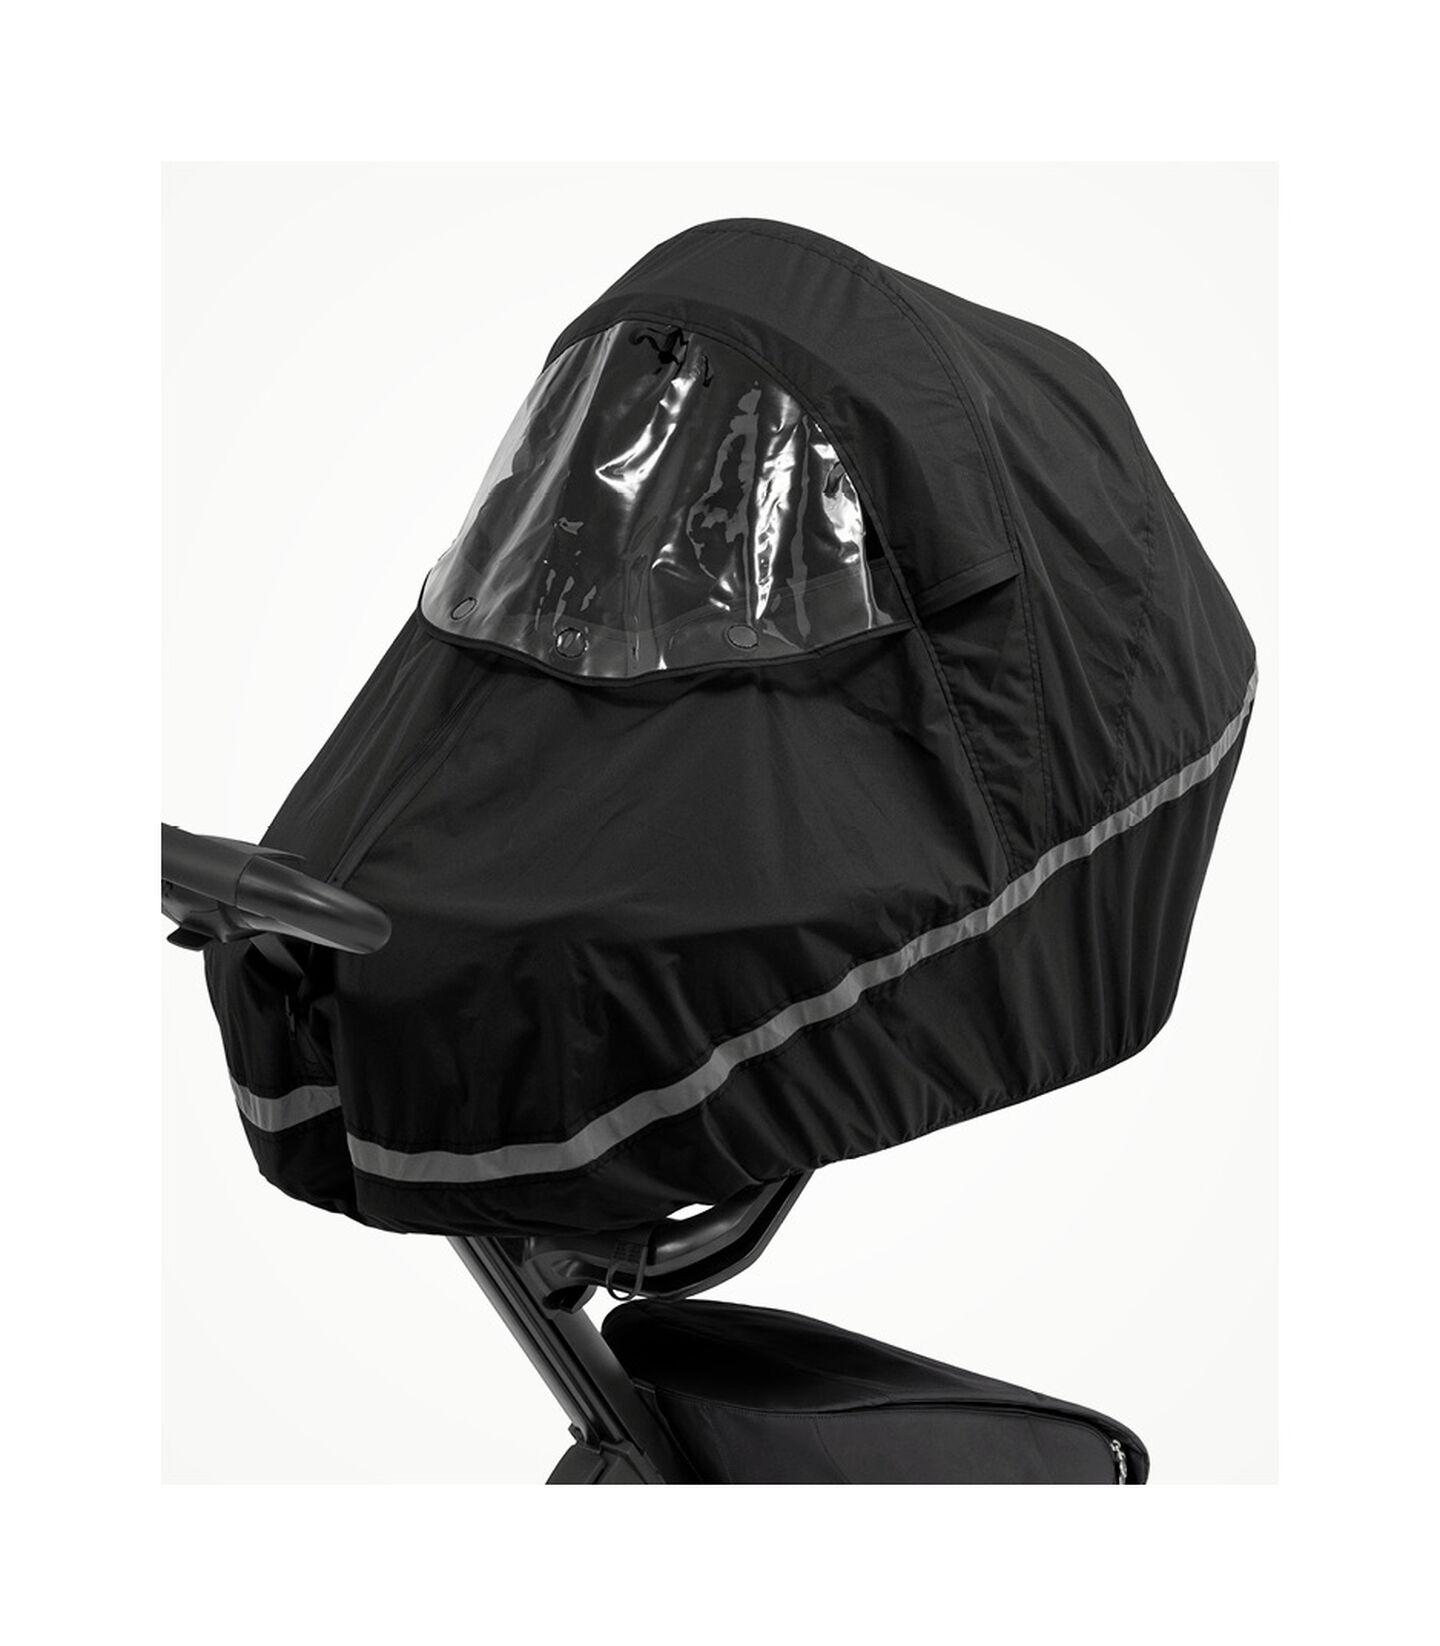 Stokke® Xplory® X Regenschutz Black, Black, mainview view 3